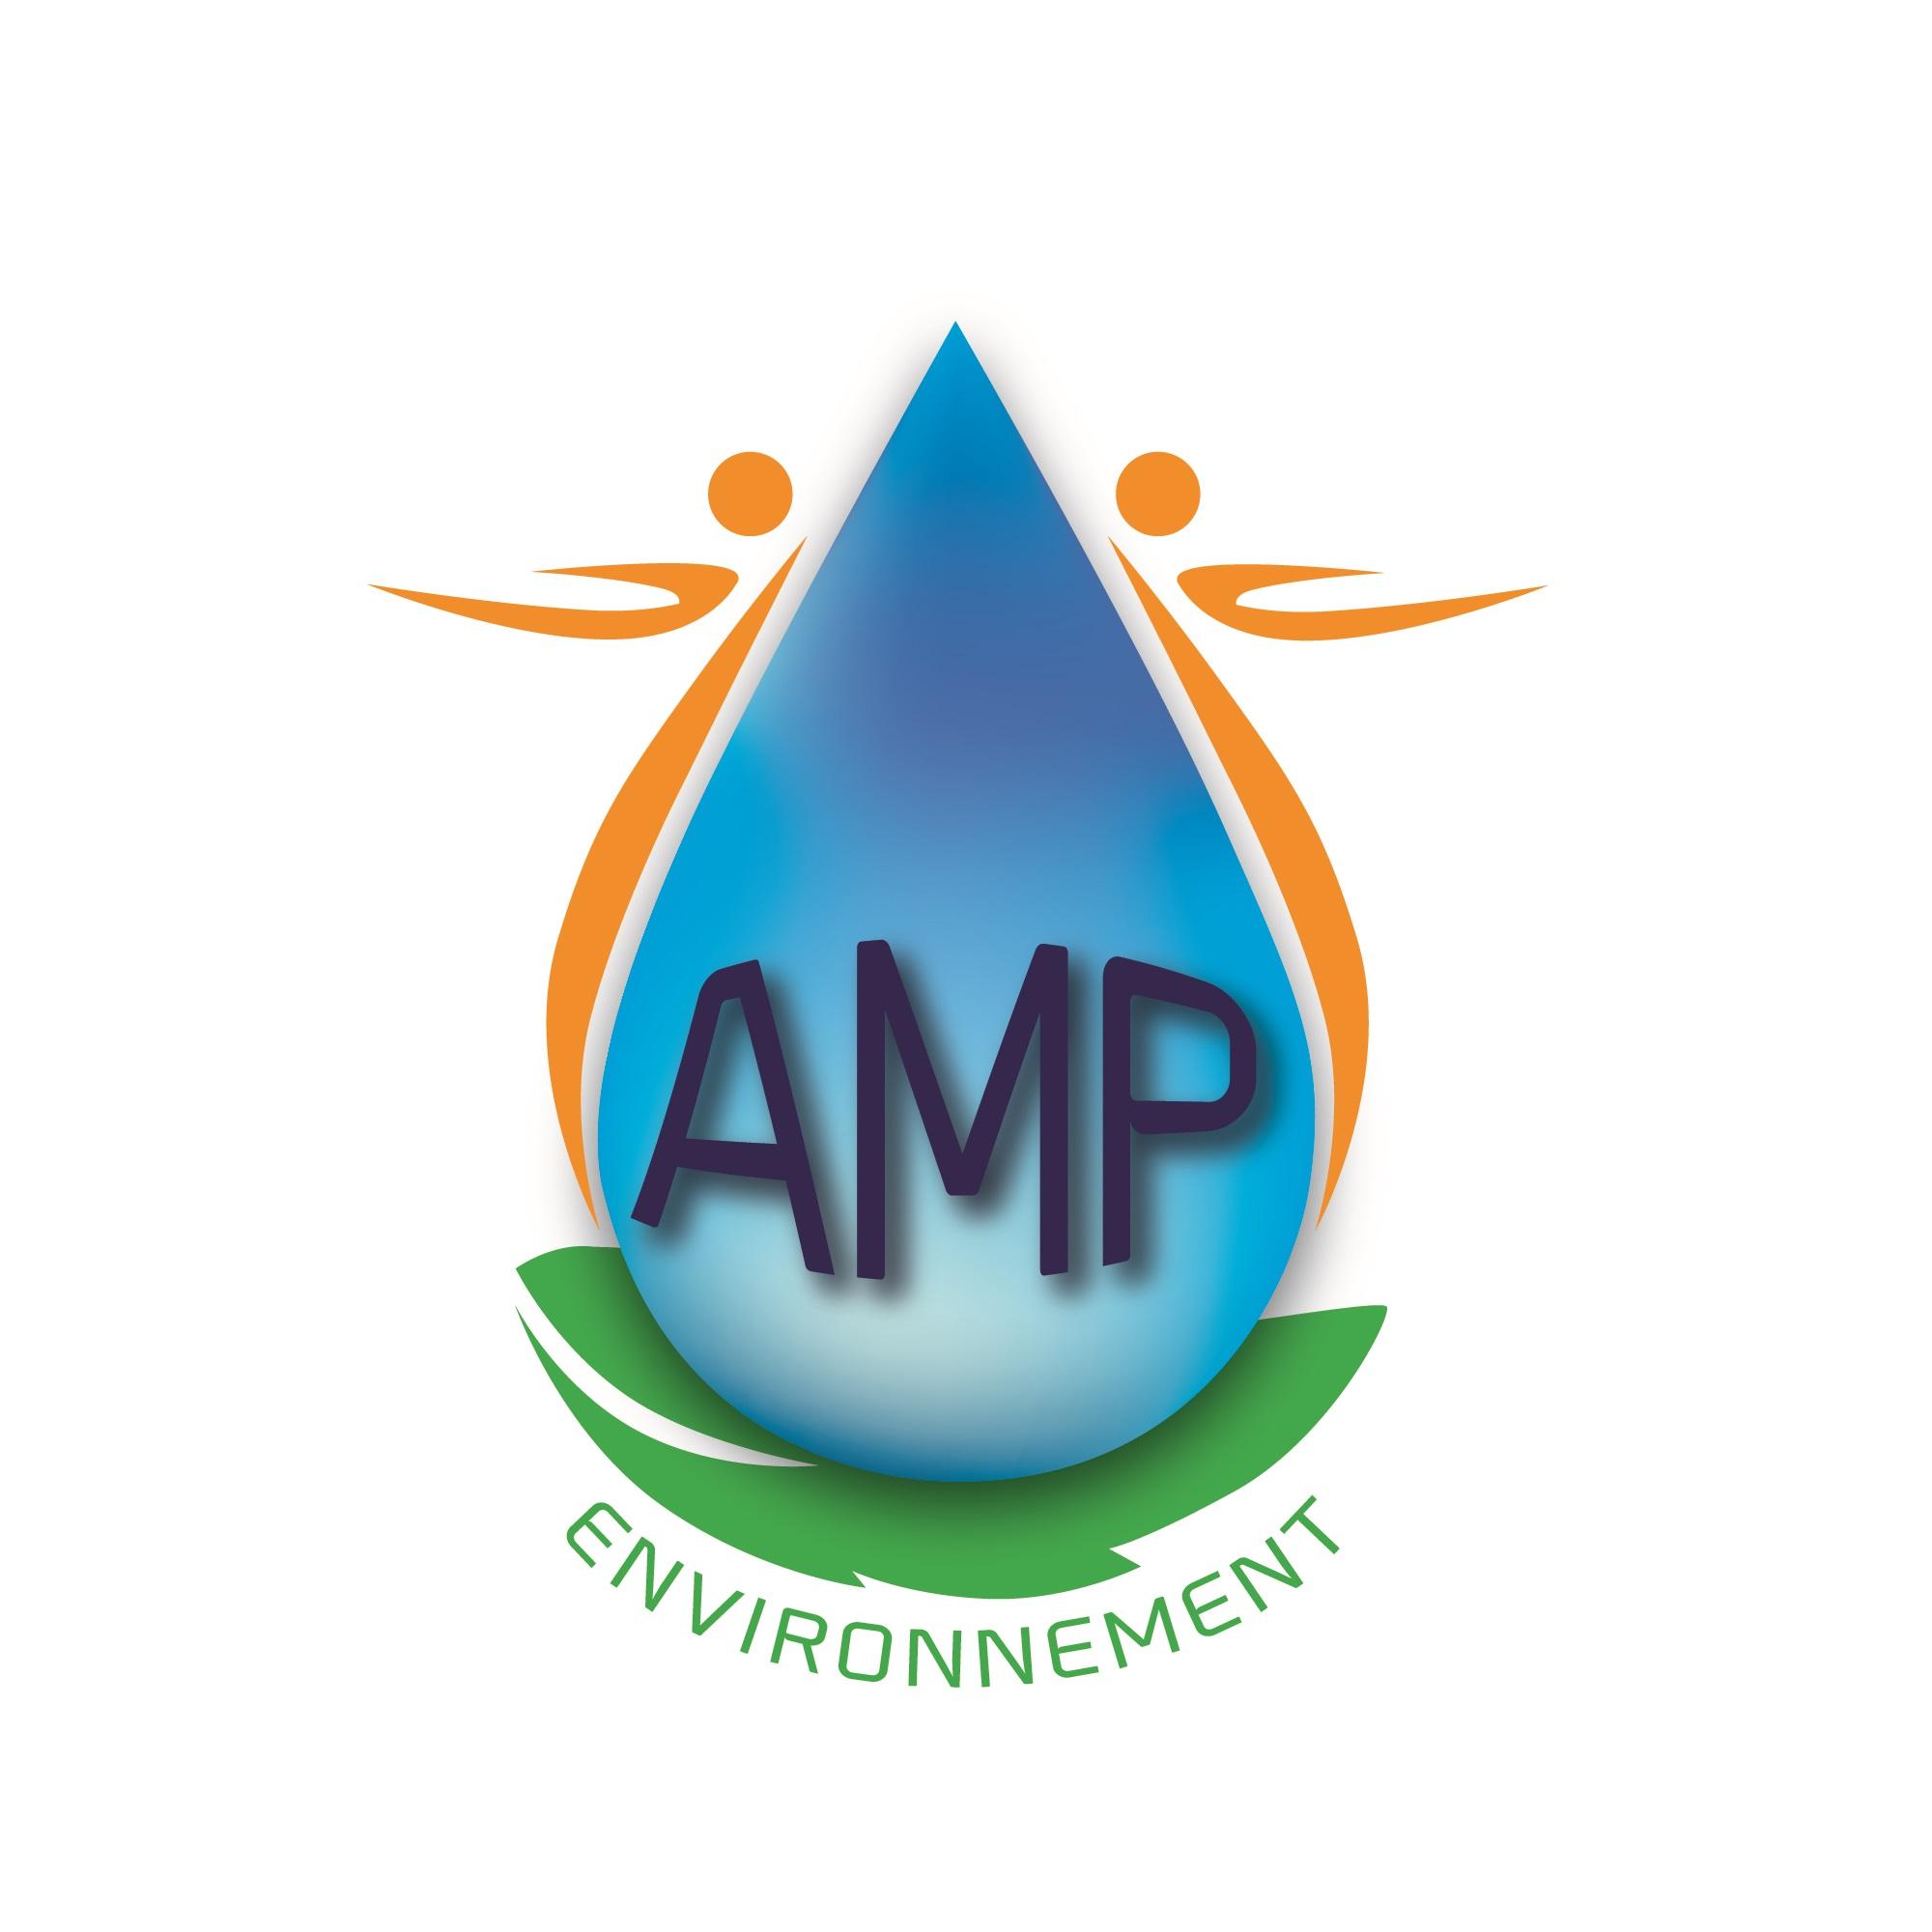 AMP environnement